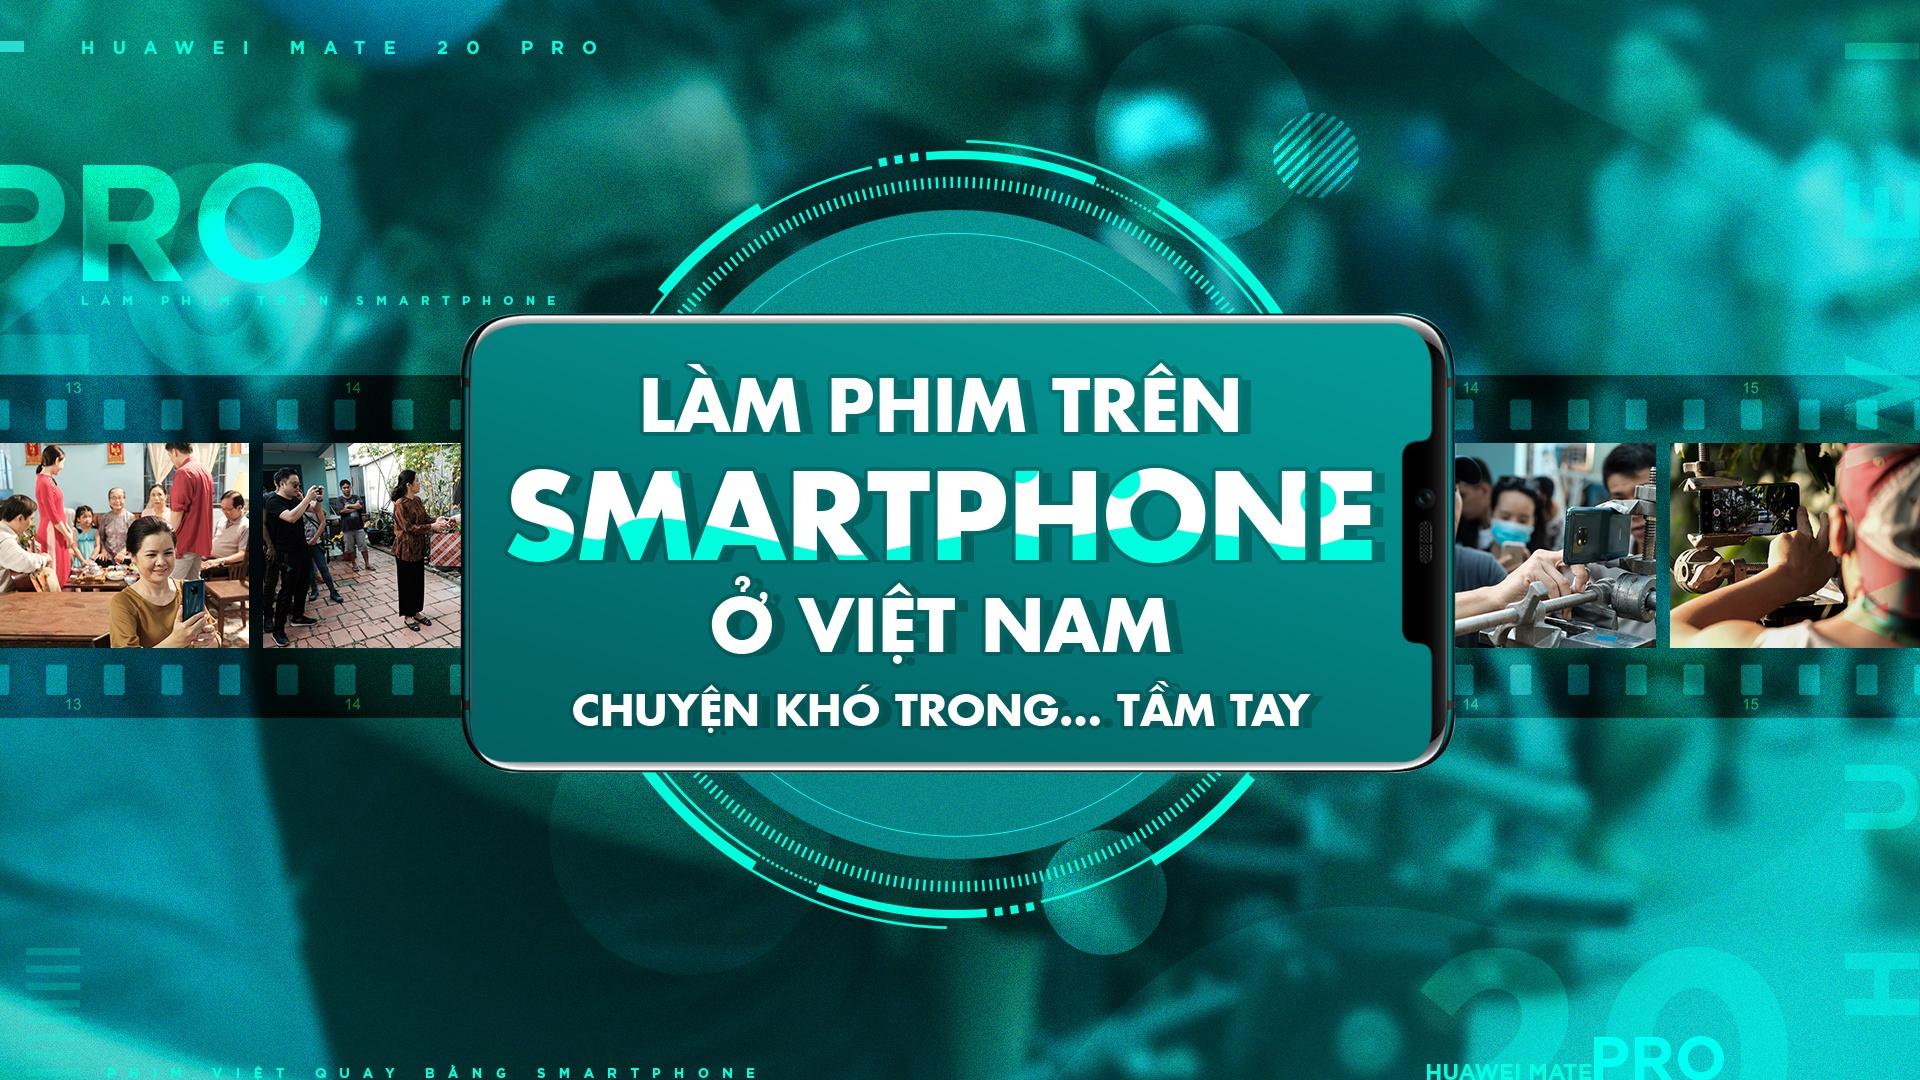 Lam phim tren smartphone o Viet Nam - chuyen kho trong… tam tay hinh anh 2